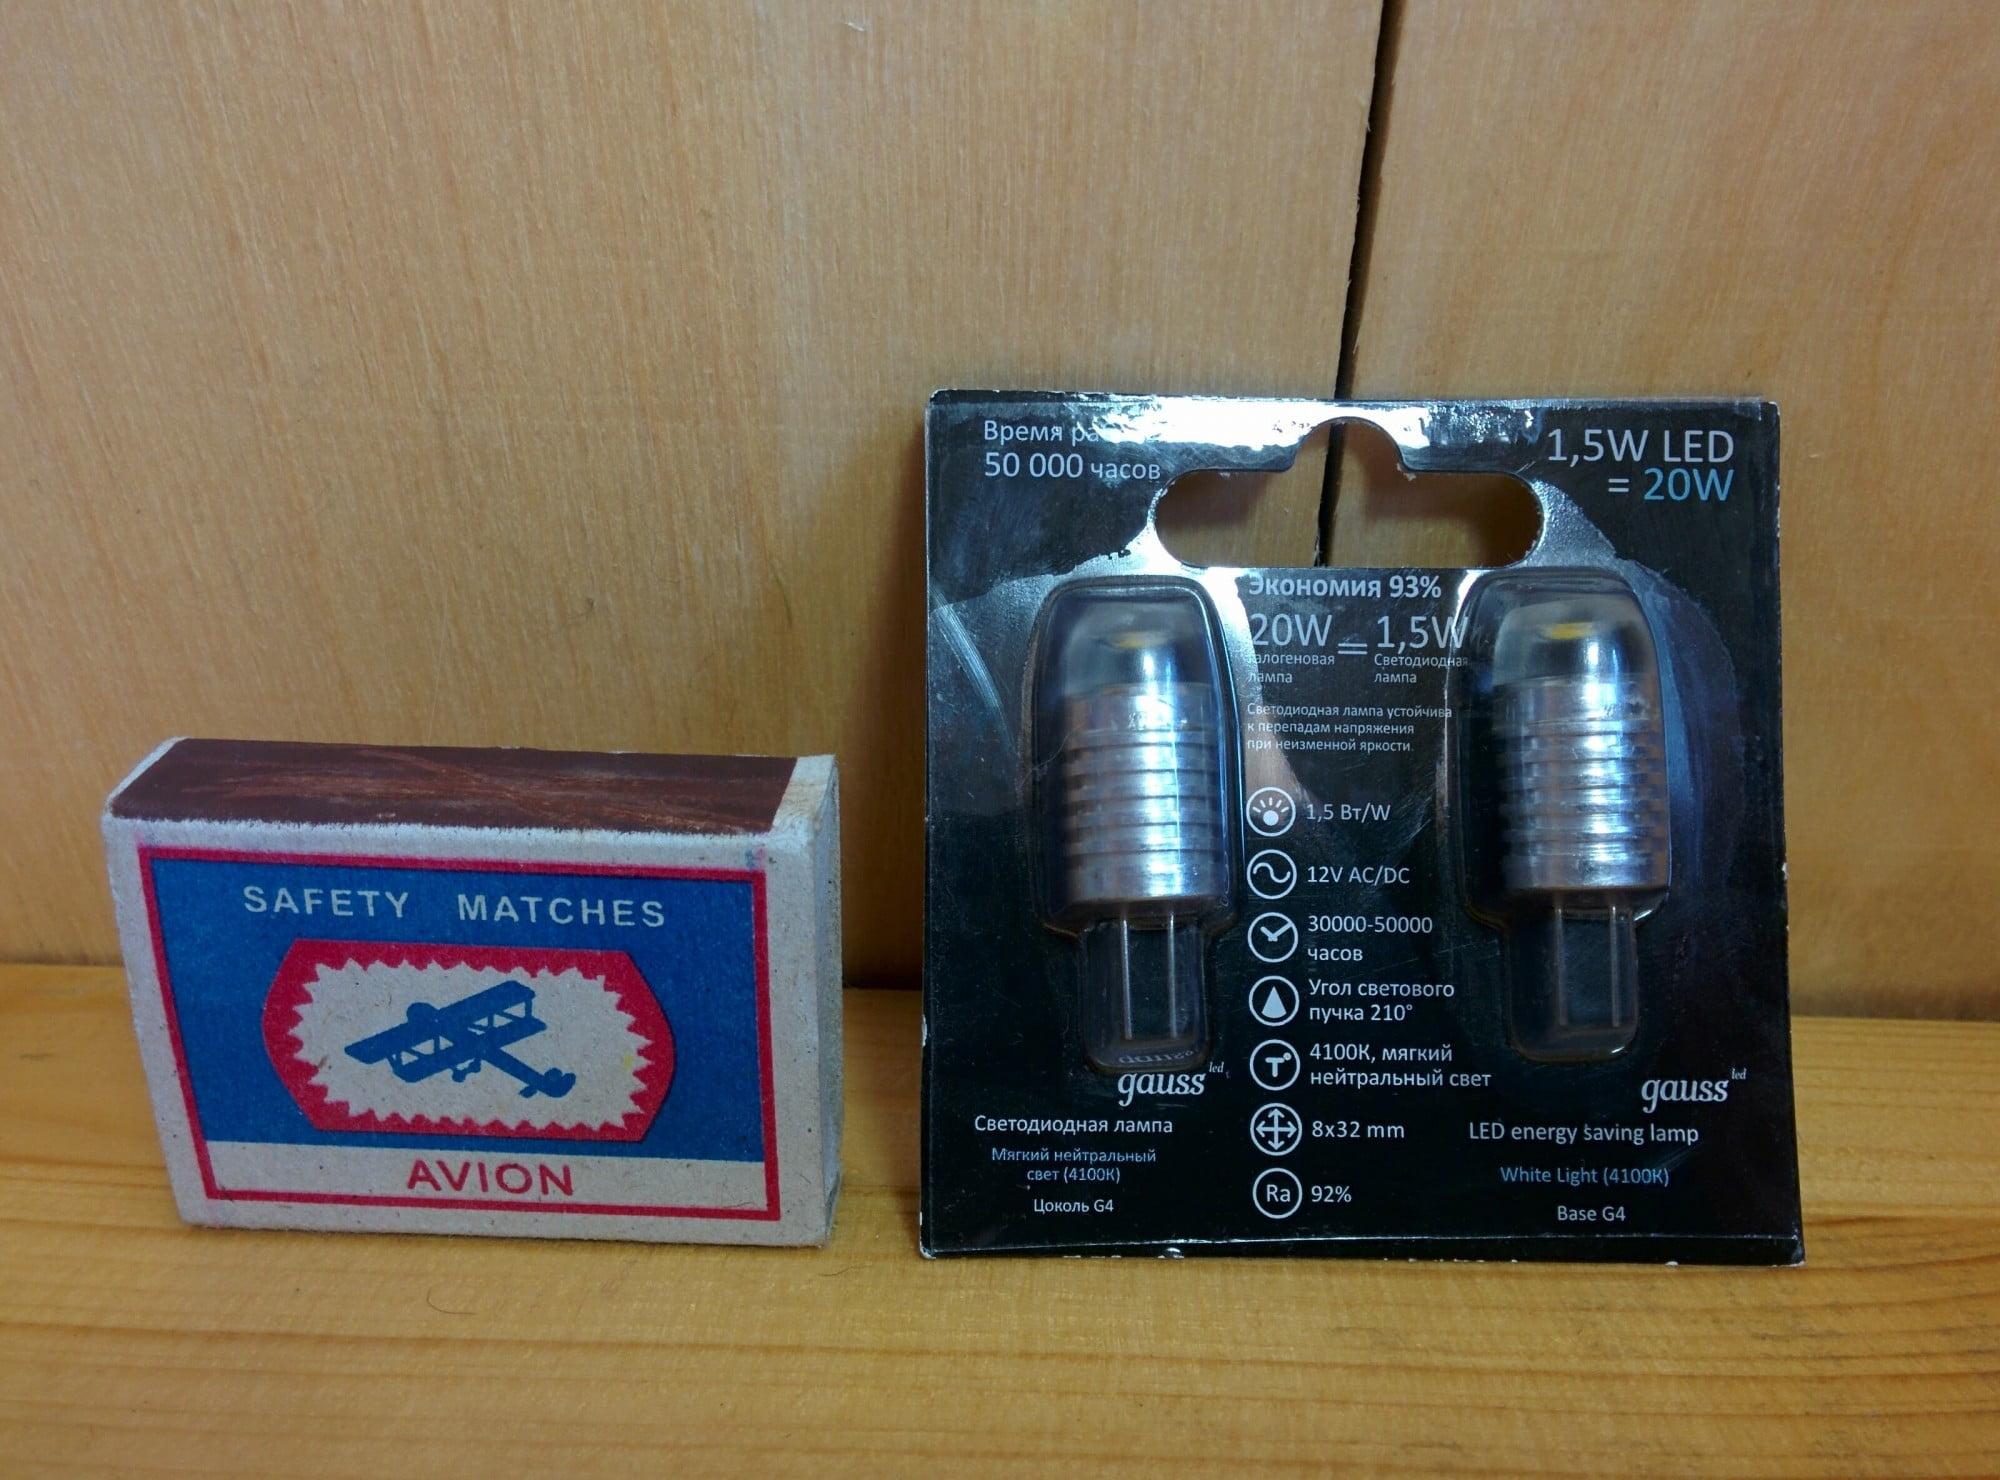 Gauss LED G4 1,5W AC/DC 12V 4100K 2 шт упаковка